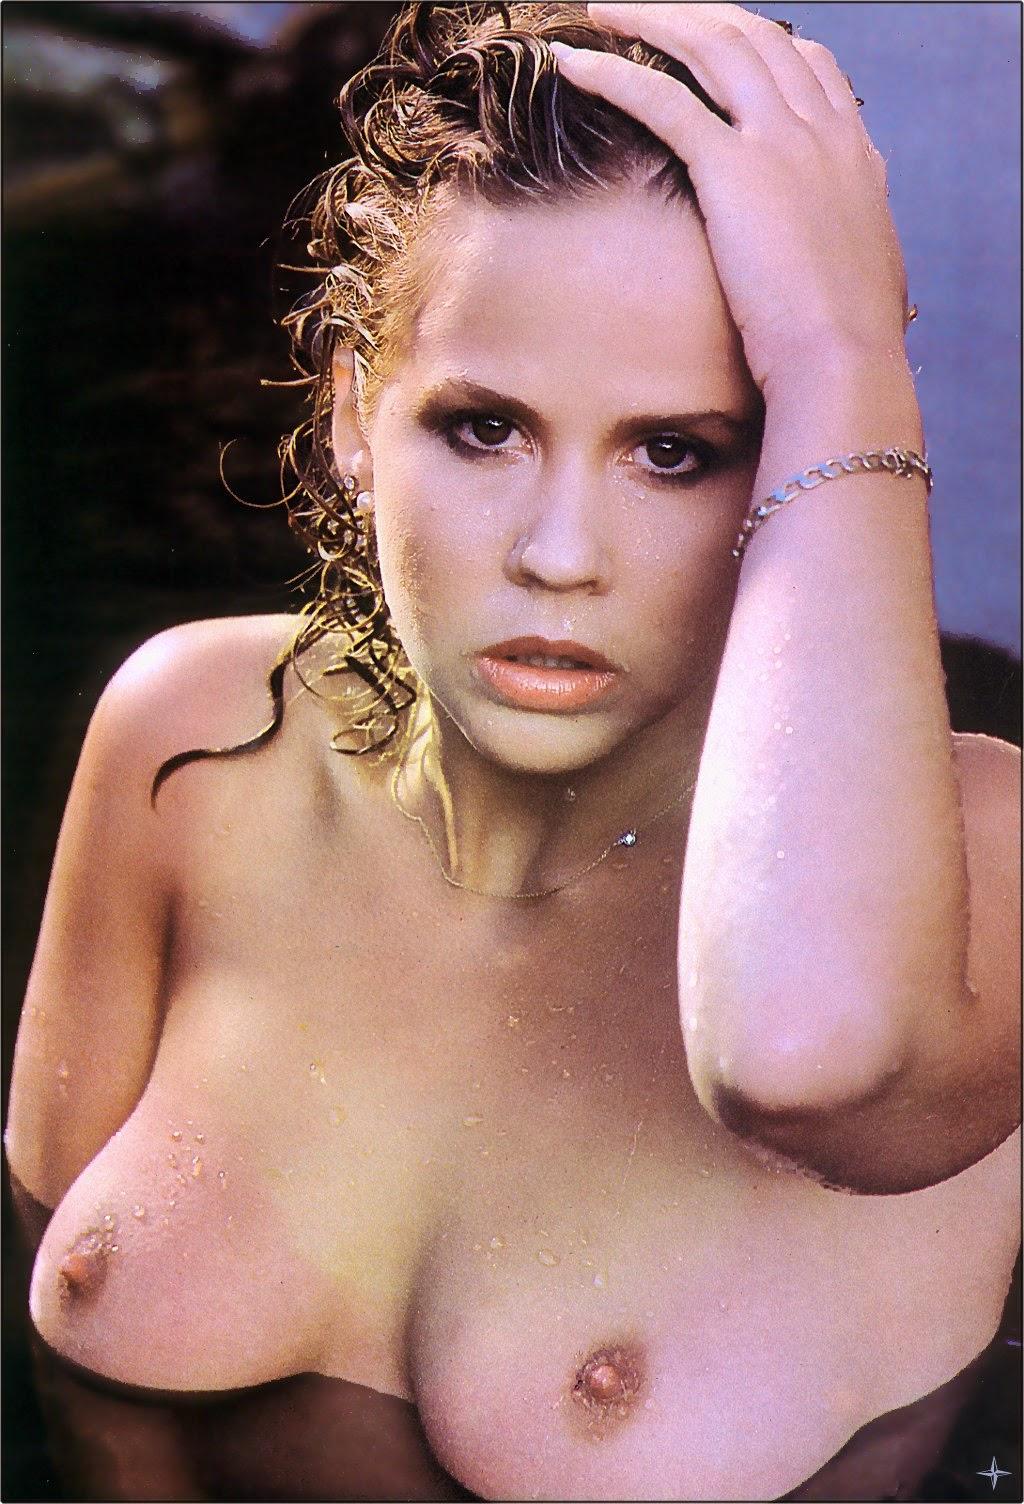 Linda blair nude anal nude — photo 5